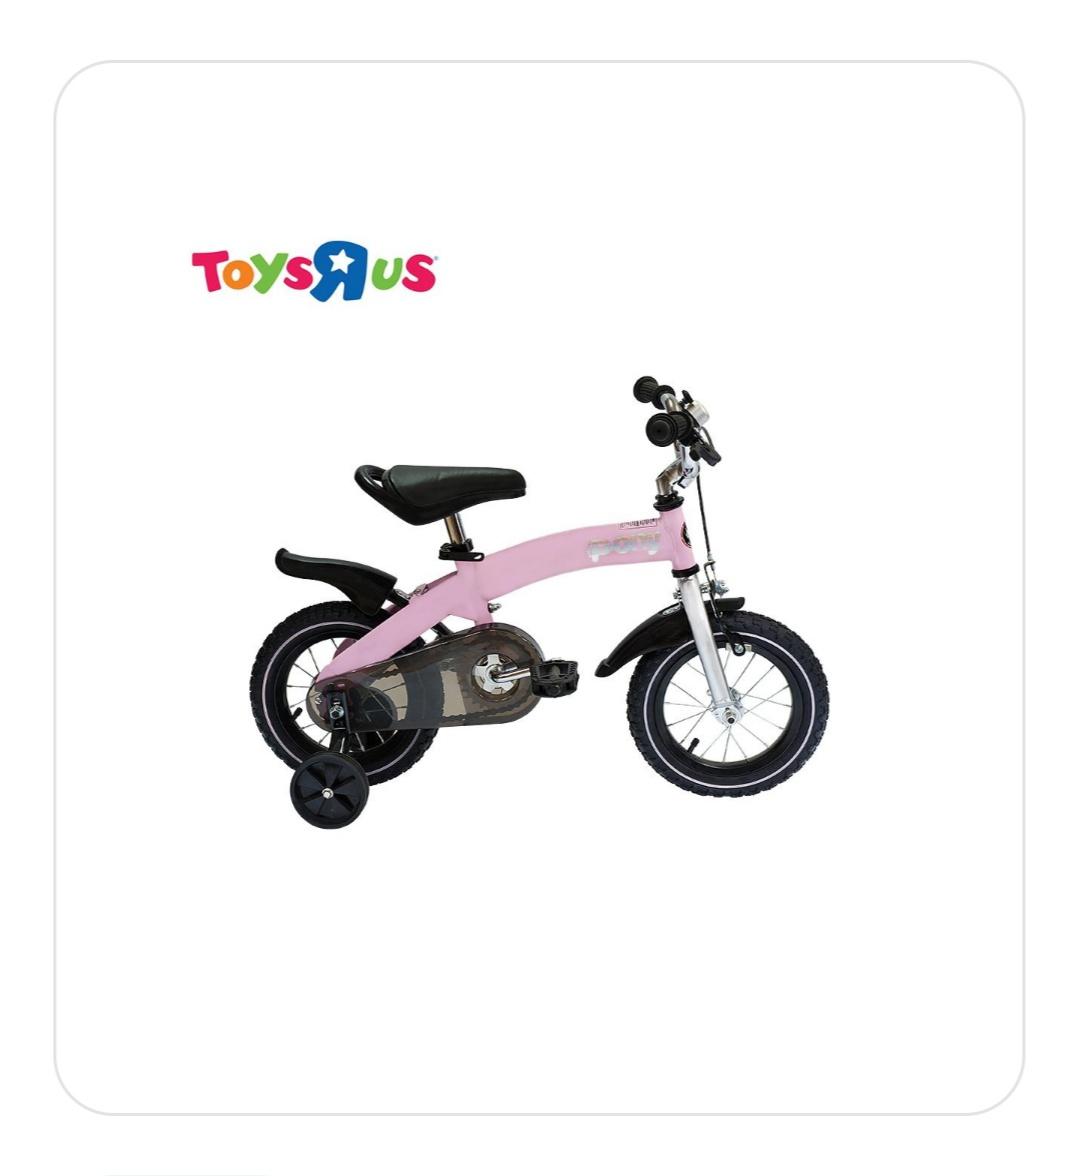 bikes: Toys R Us Philippines